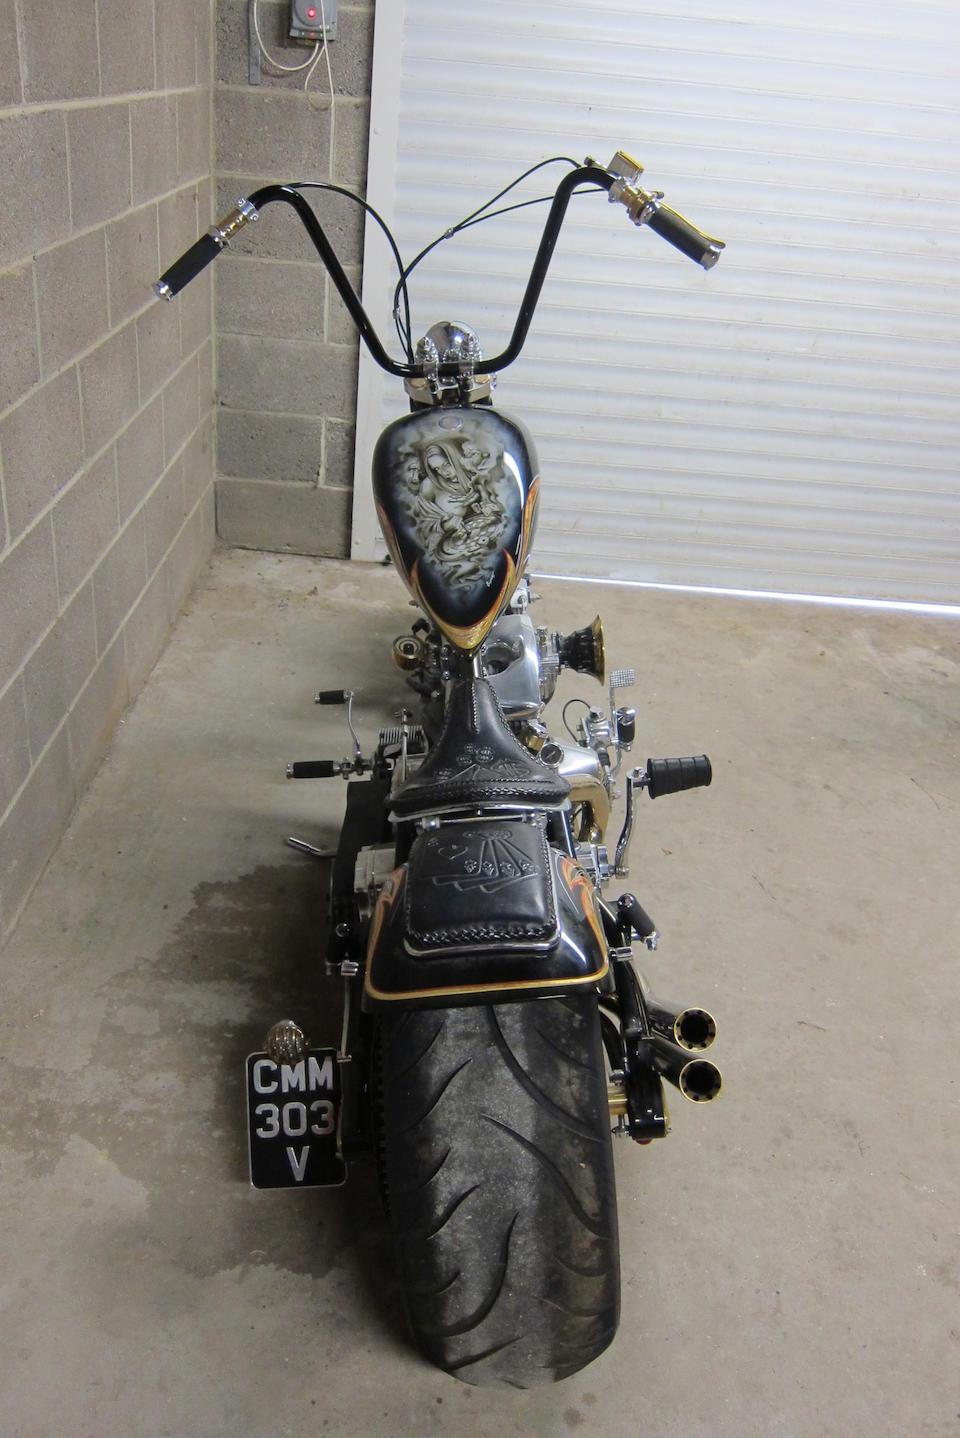 1979 Harley Davidson 1208cc FXE Super Glide 'Lucky 13 Shovel' Frame no. 9D67657H9 Engine no. 9D67657H9